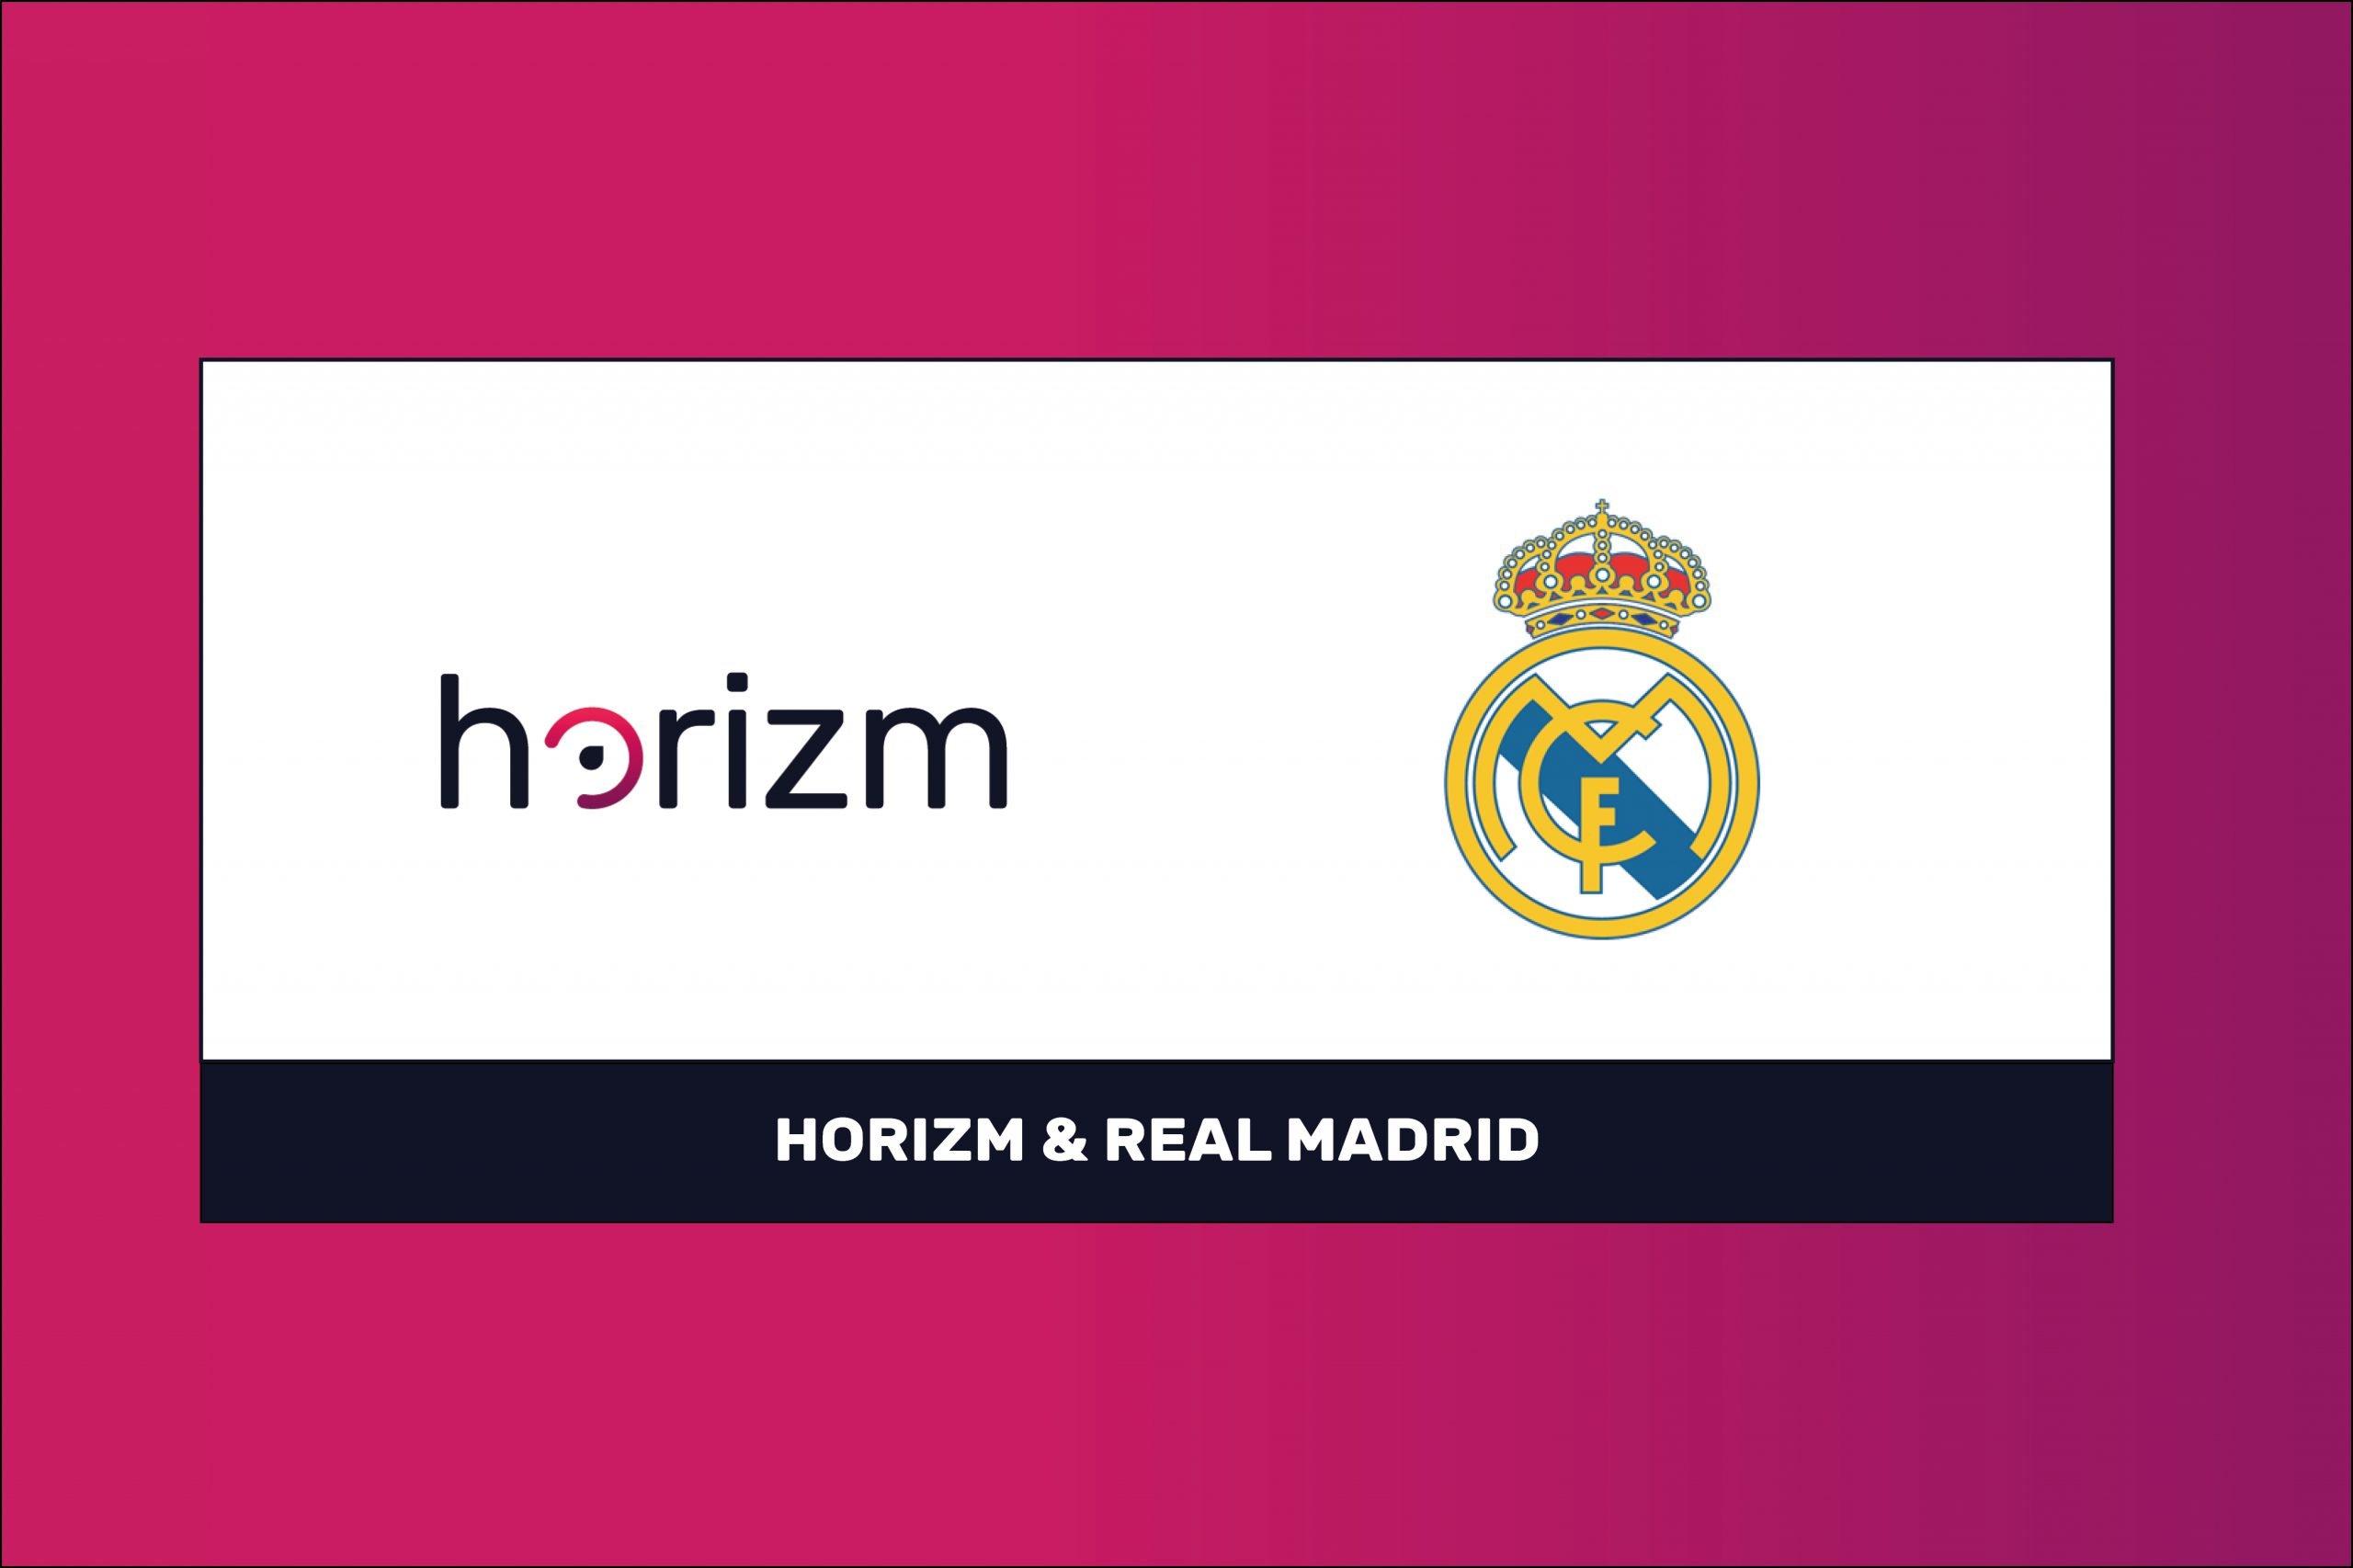 Real Madrid CF & Horizm set new standards in digital innovation & valuation